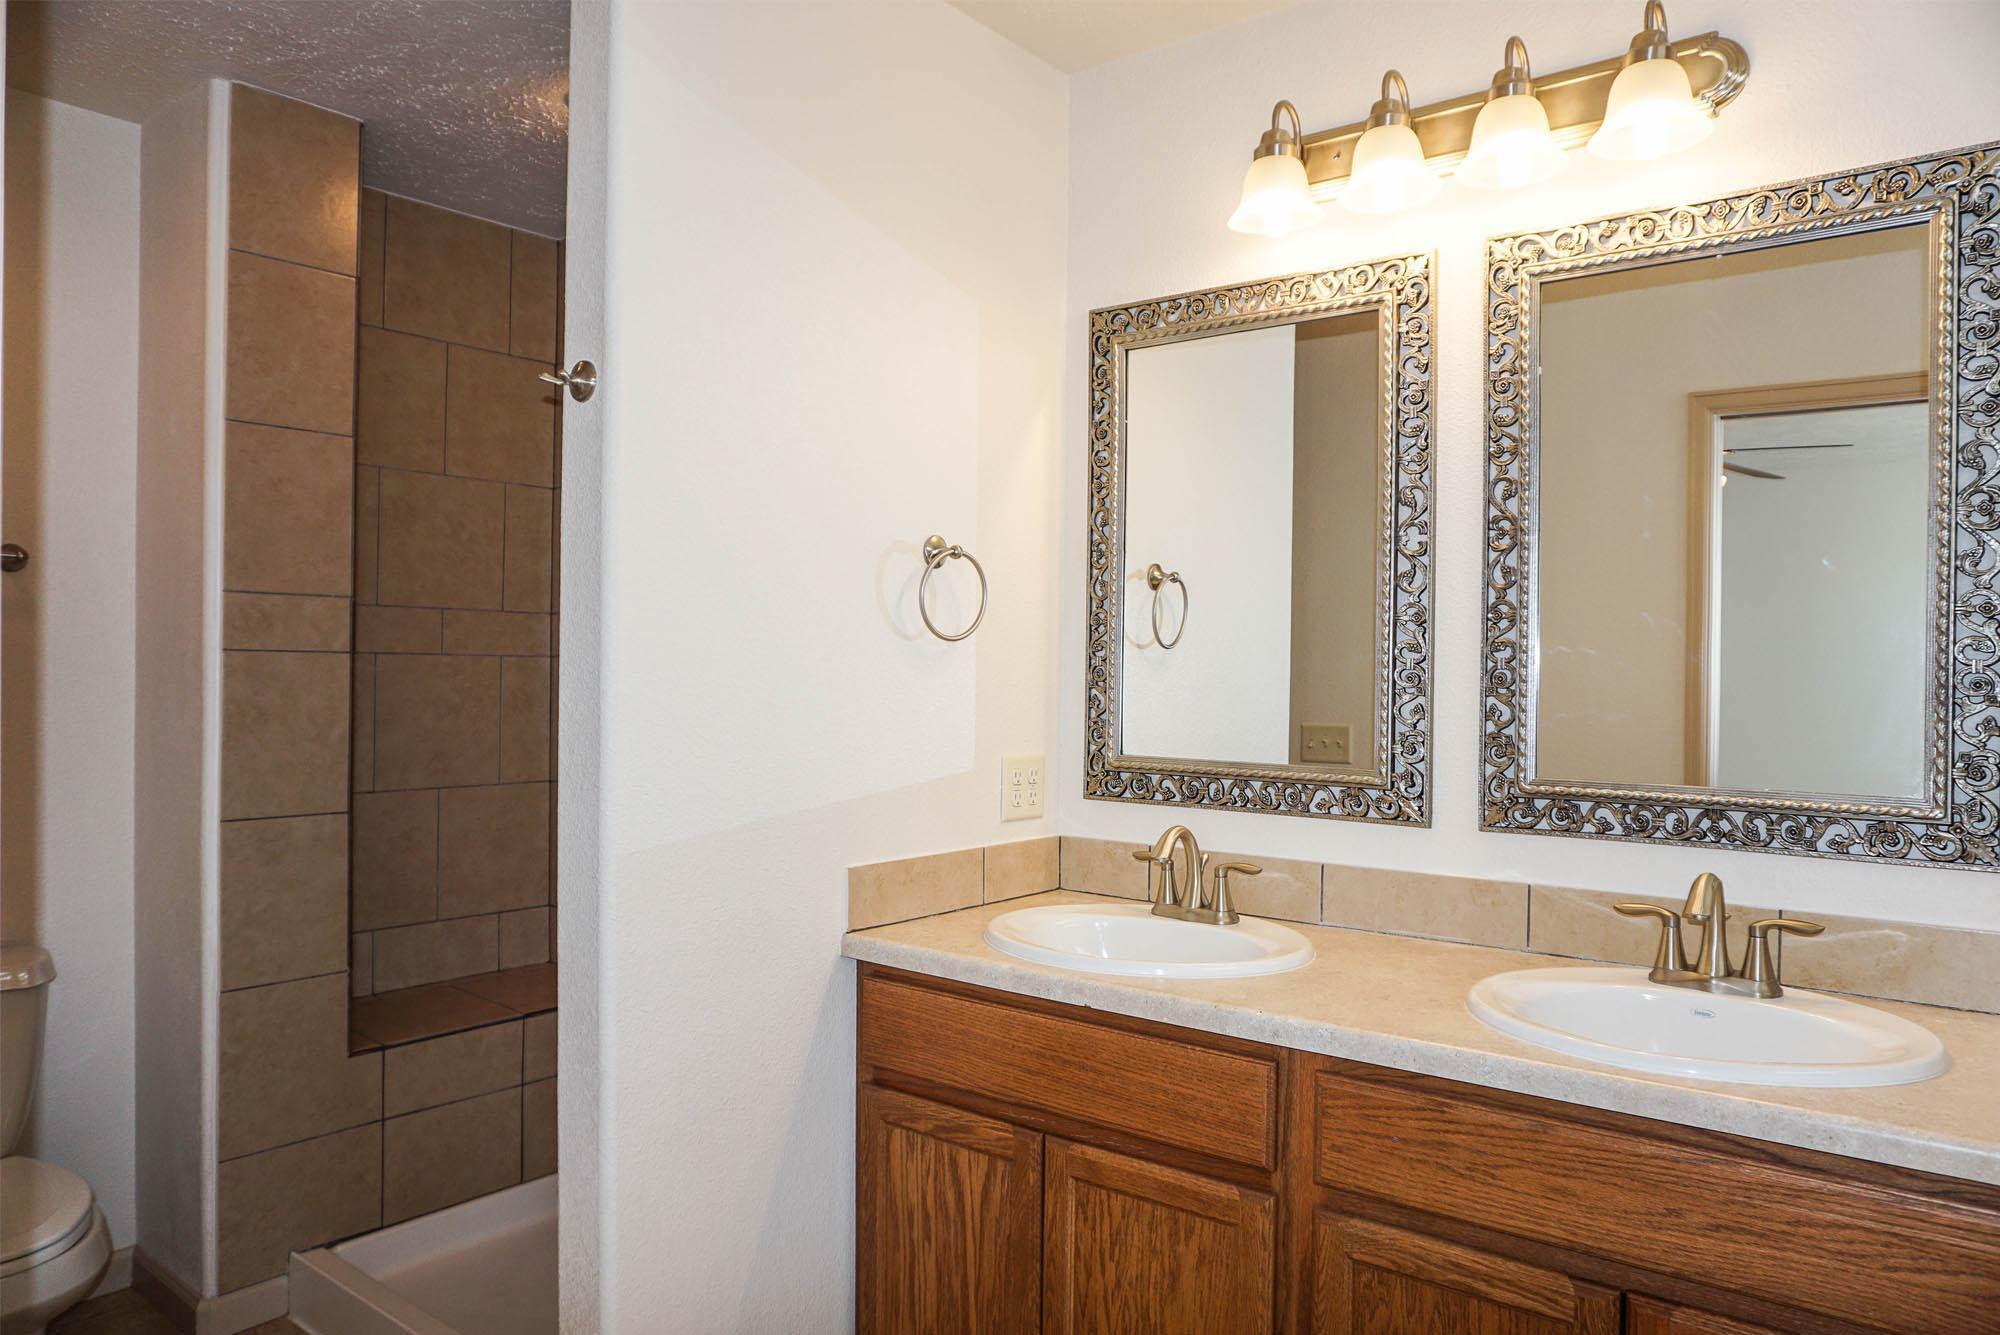 161 Sun Hawk master bath with double vanities & step-in shower